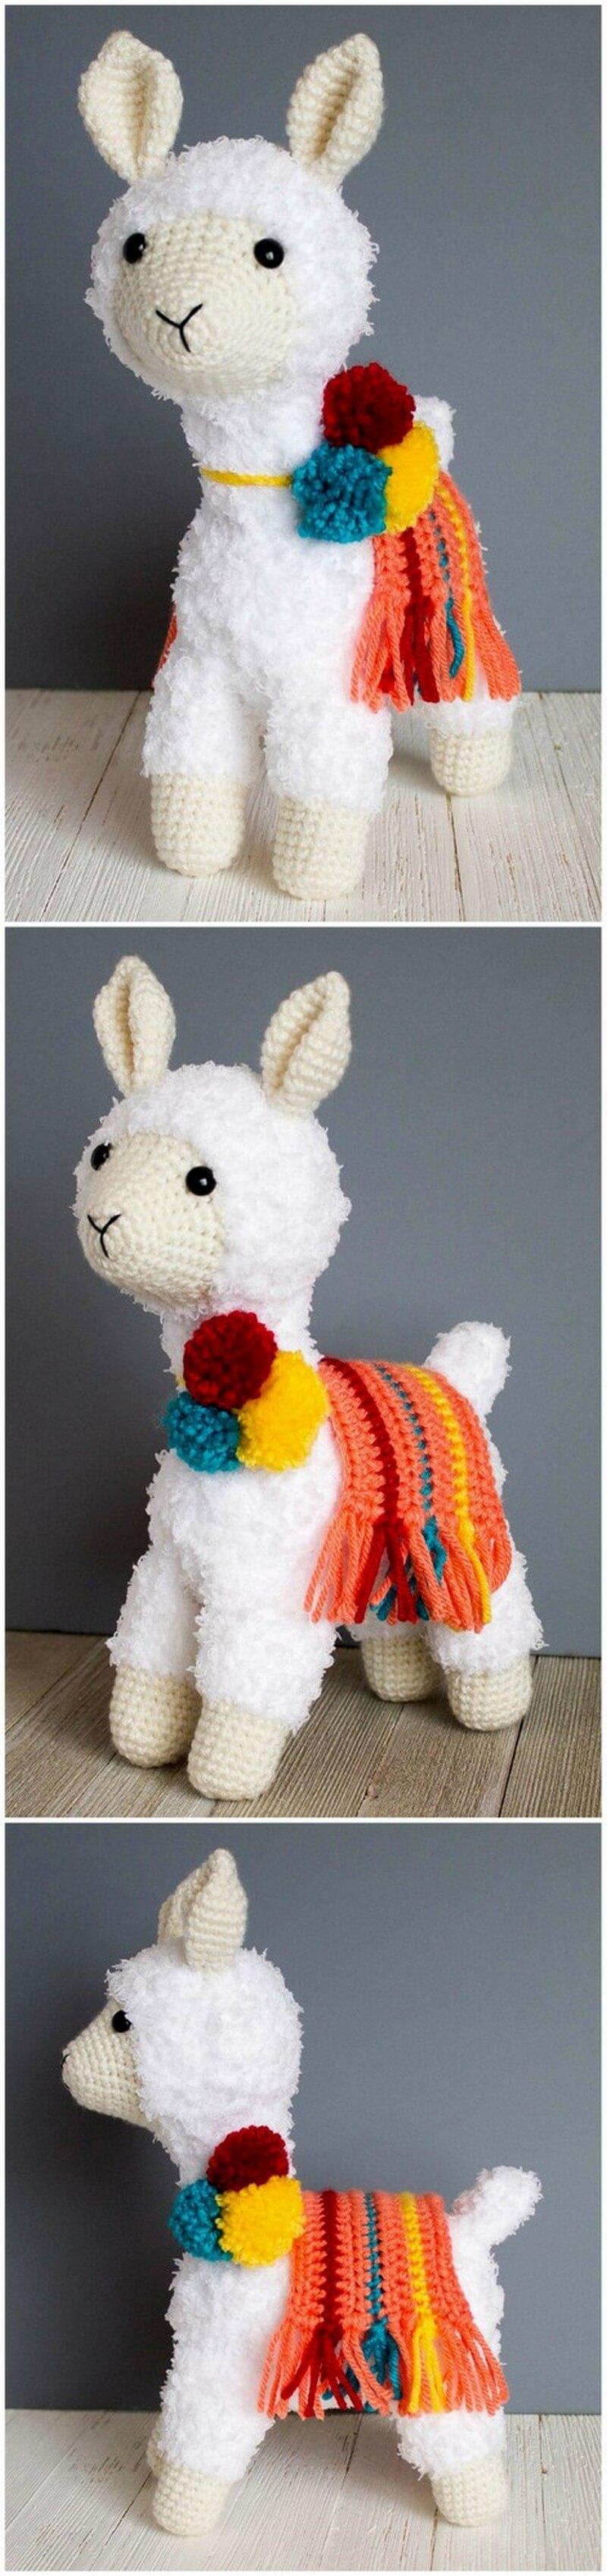 Free Crochet Amigurumi Pattern (14)